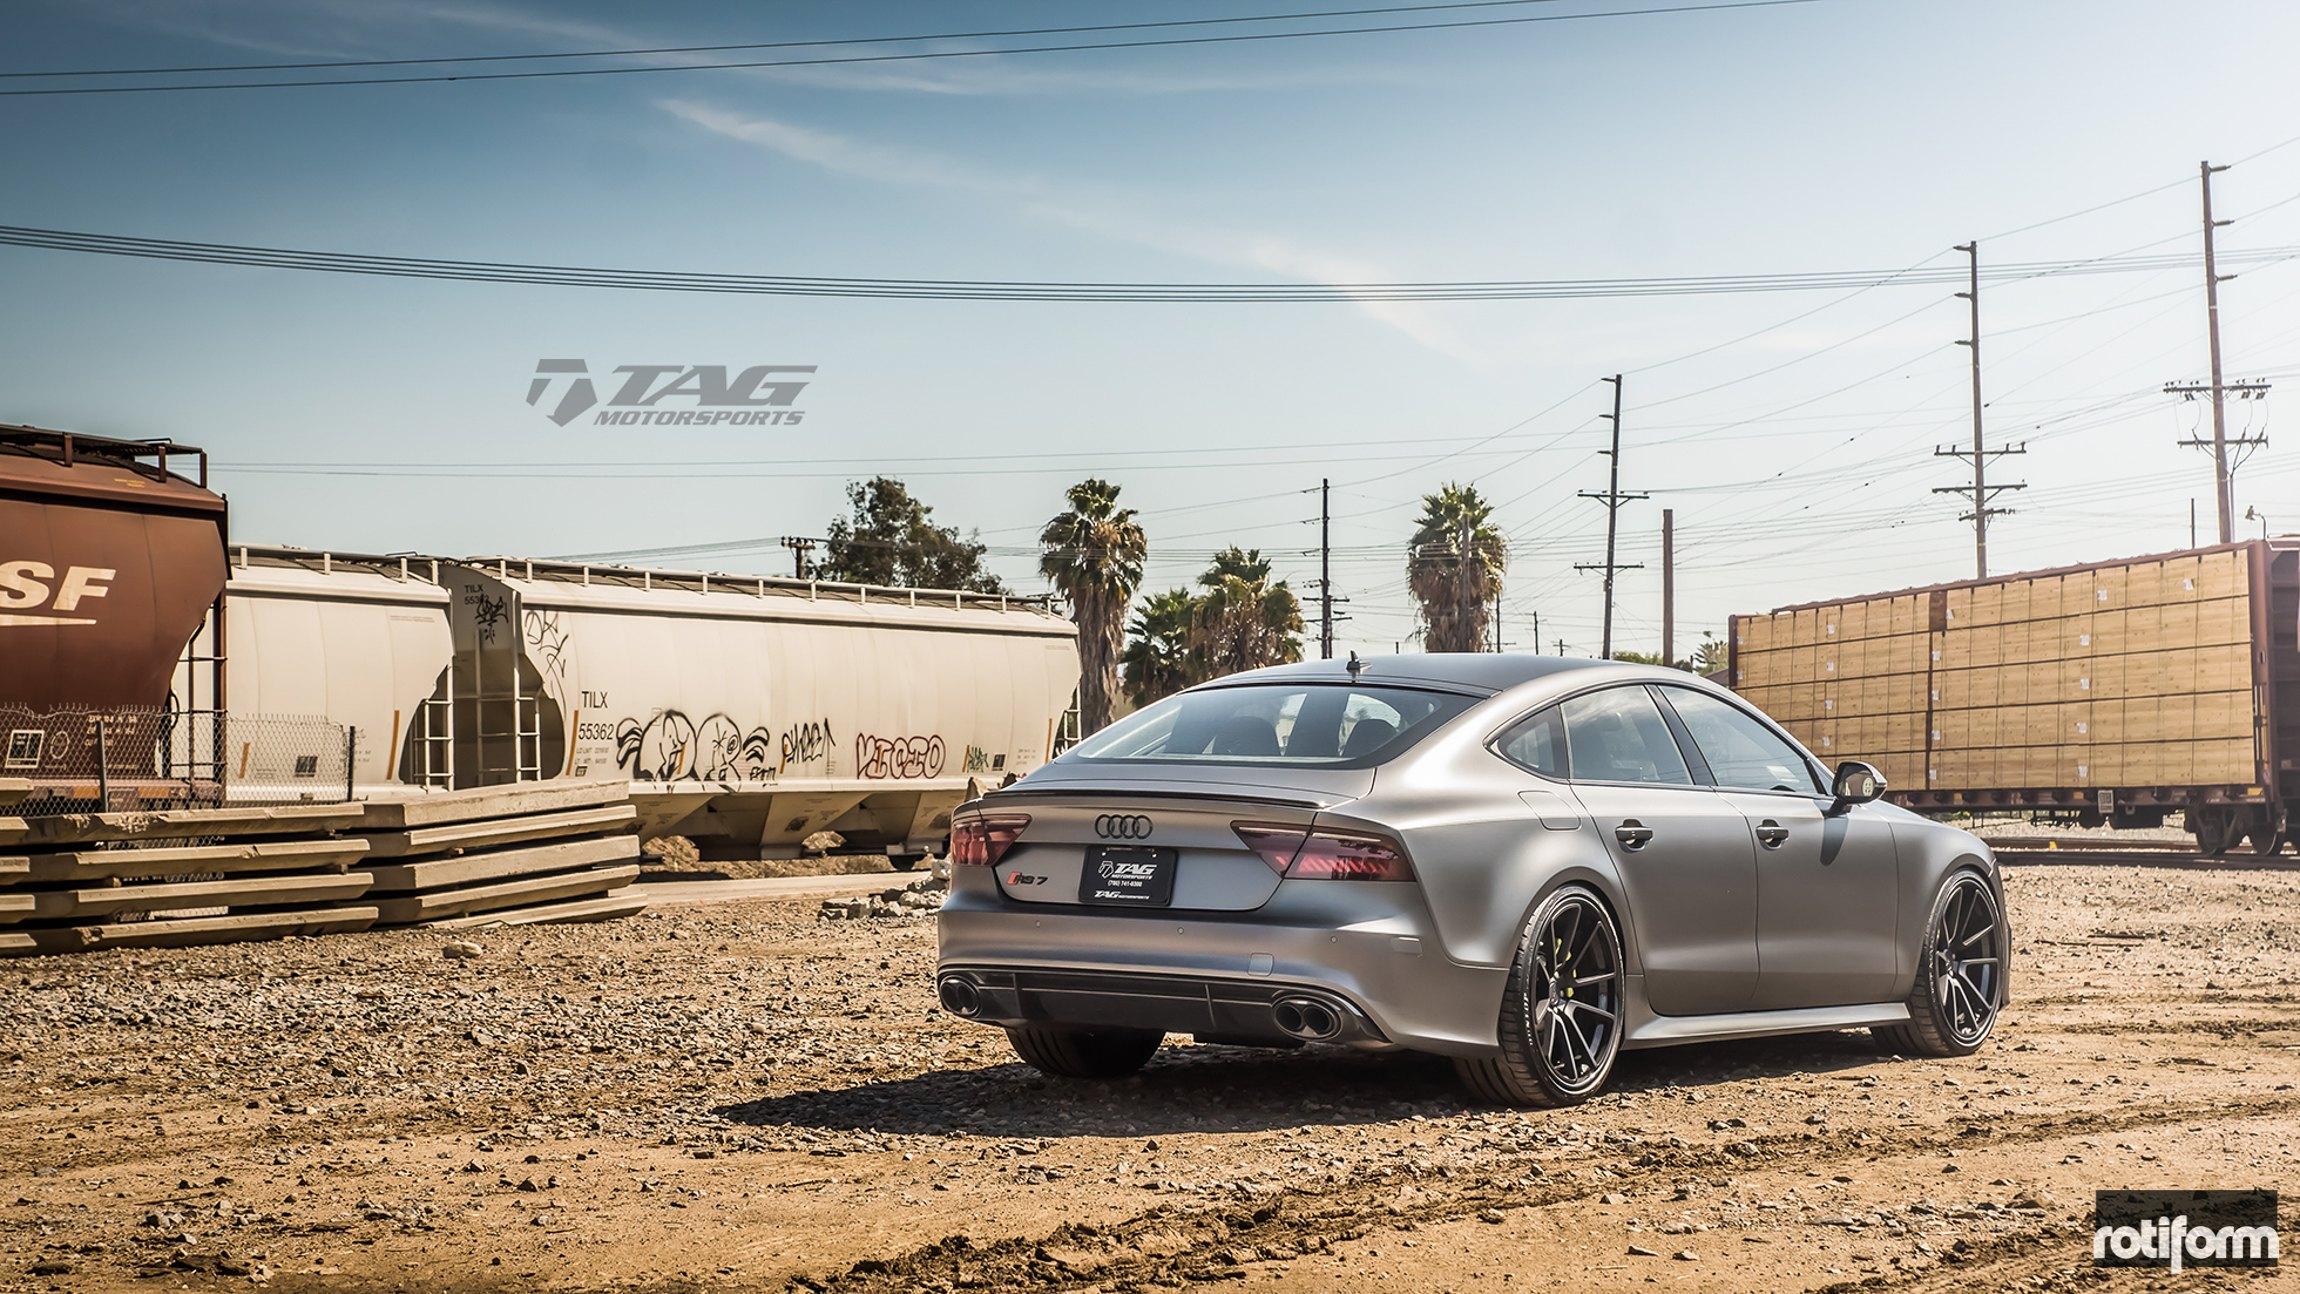 Stunning Matte Gray Audi Rs7 Rocking Sharp Rotiform Custom Wheels